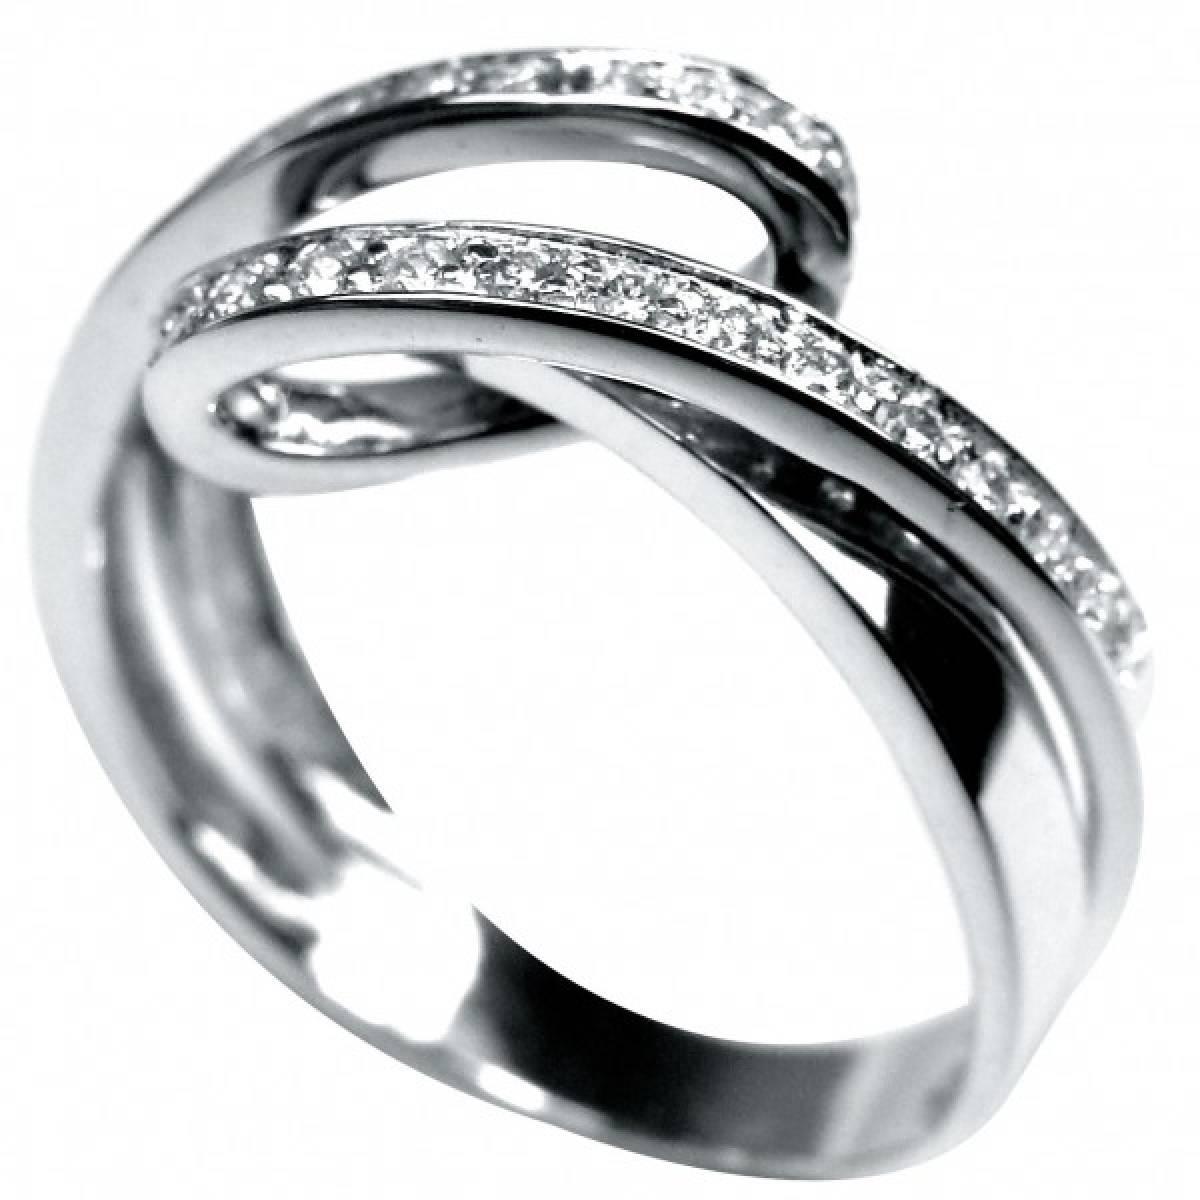 Anel de Noivado ouro branco de 19,2 kts, com 26 diamantes de 0,30 cts